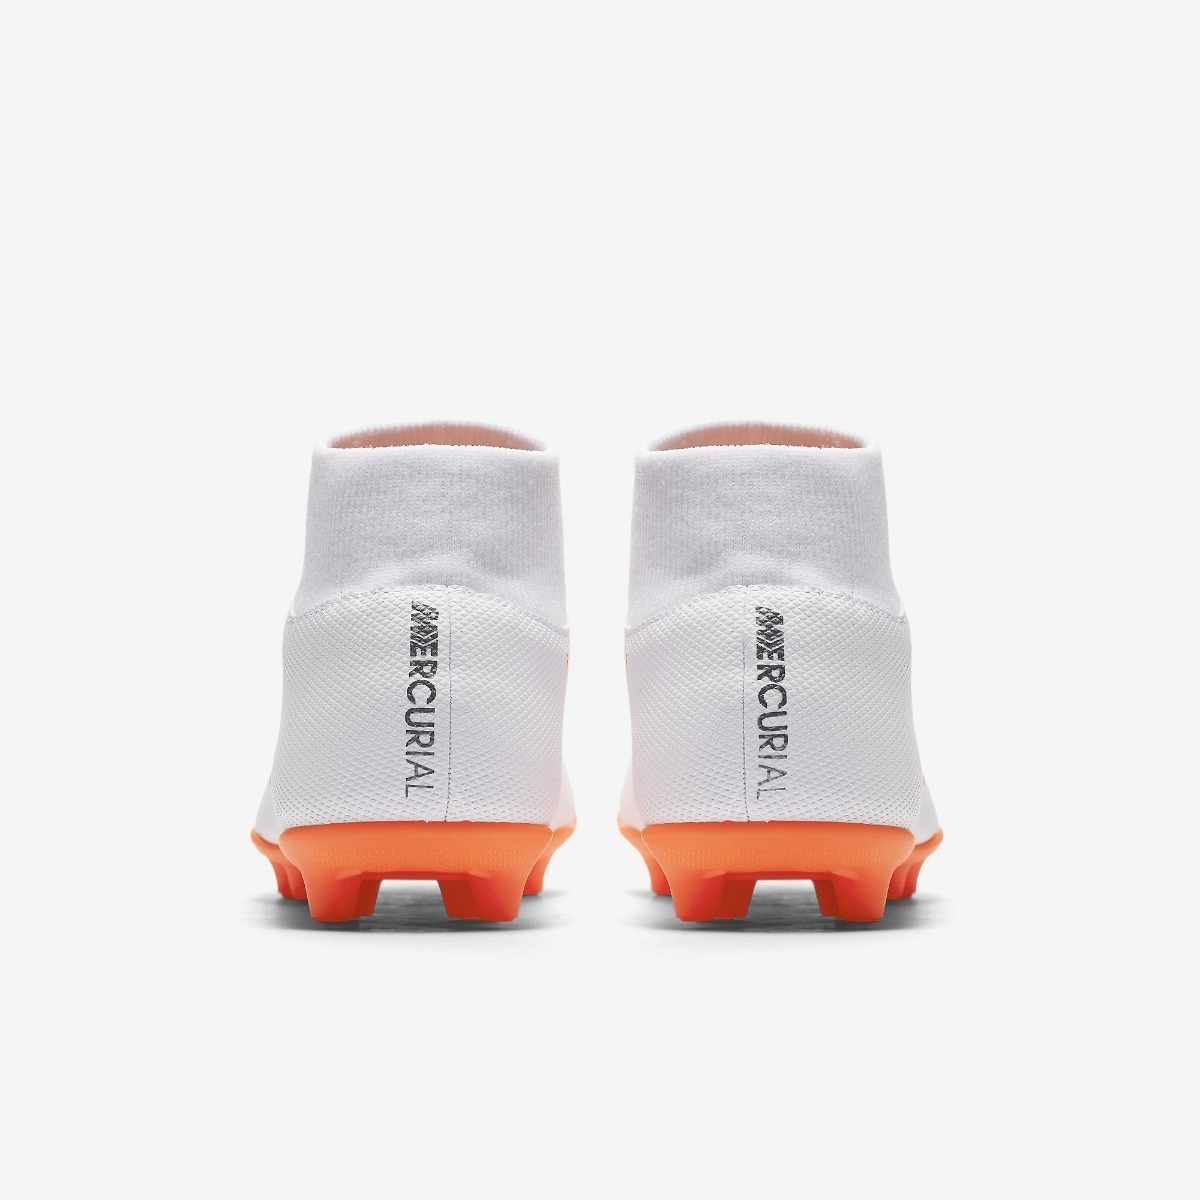 716342726d Chuteira Nike Mercurial Superfly 6 Club Mg Campo Botinha - R  249